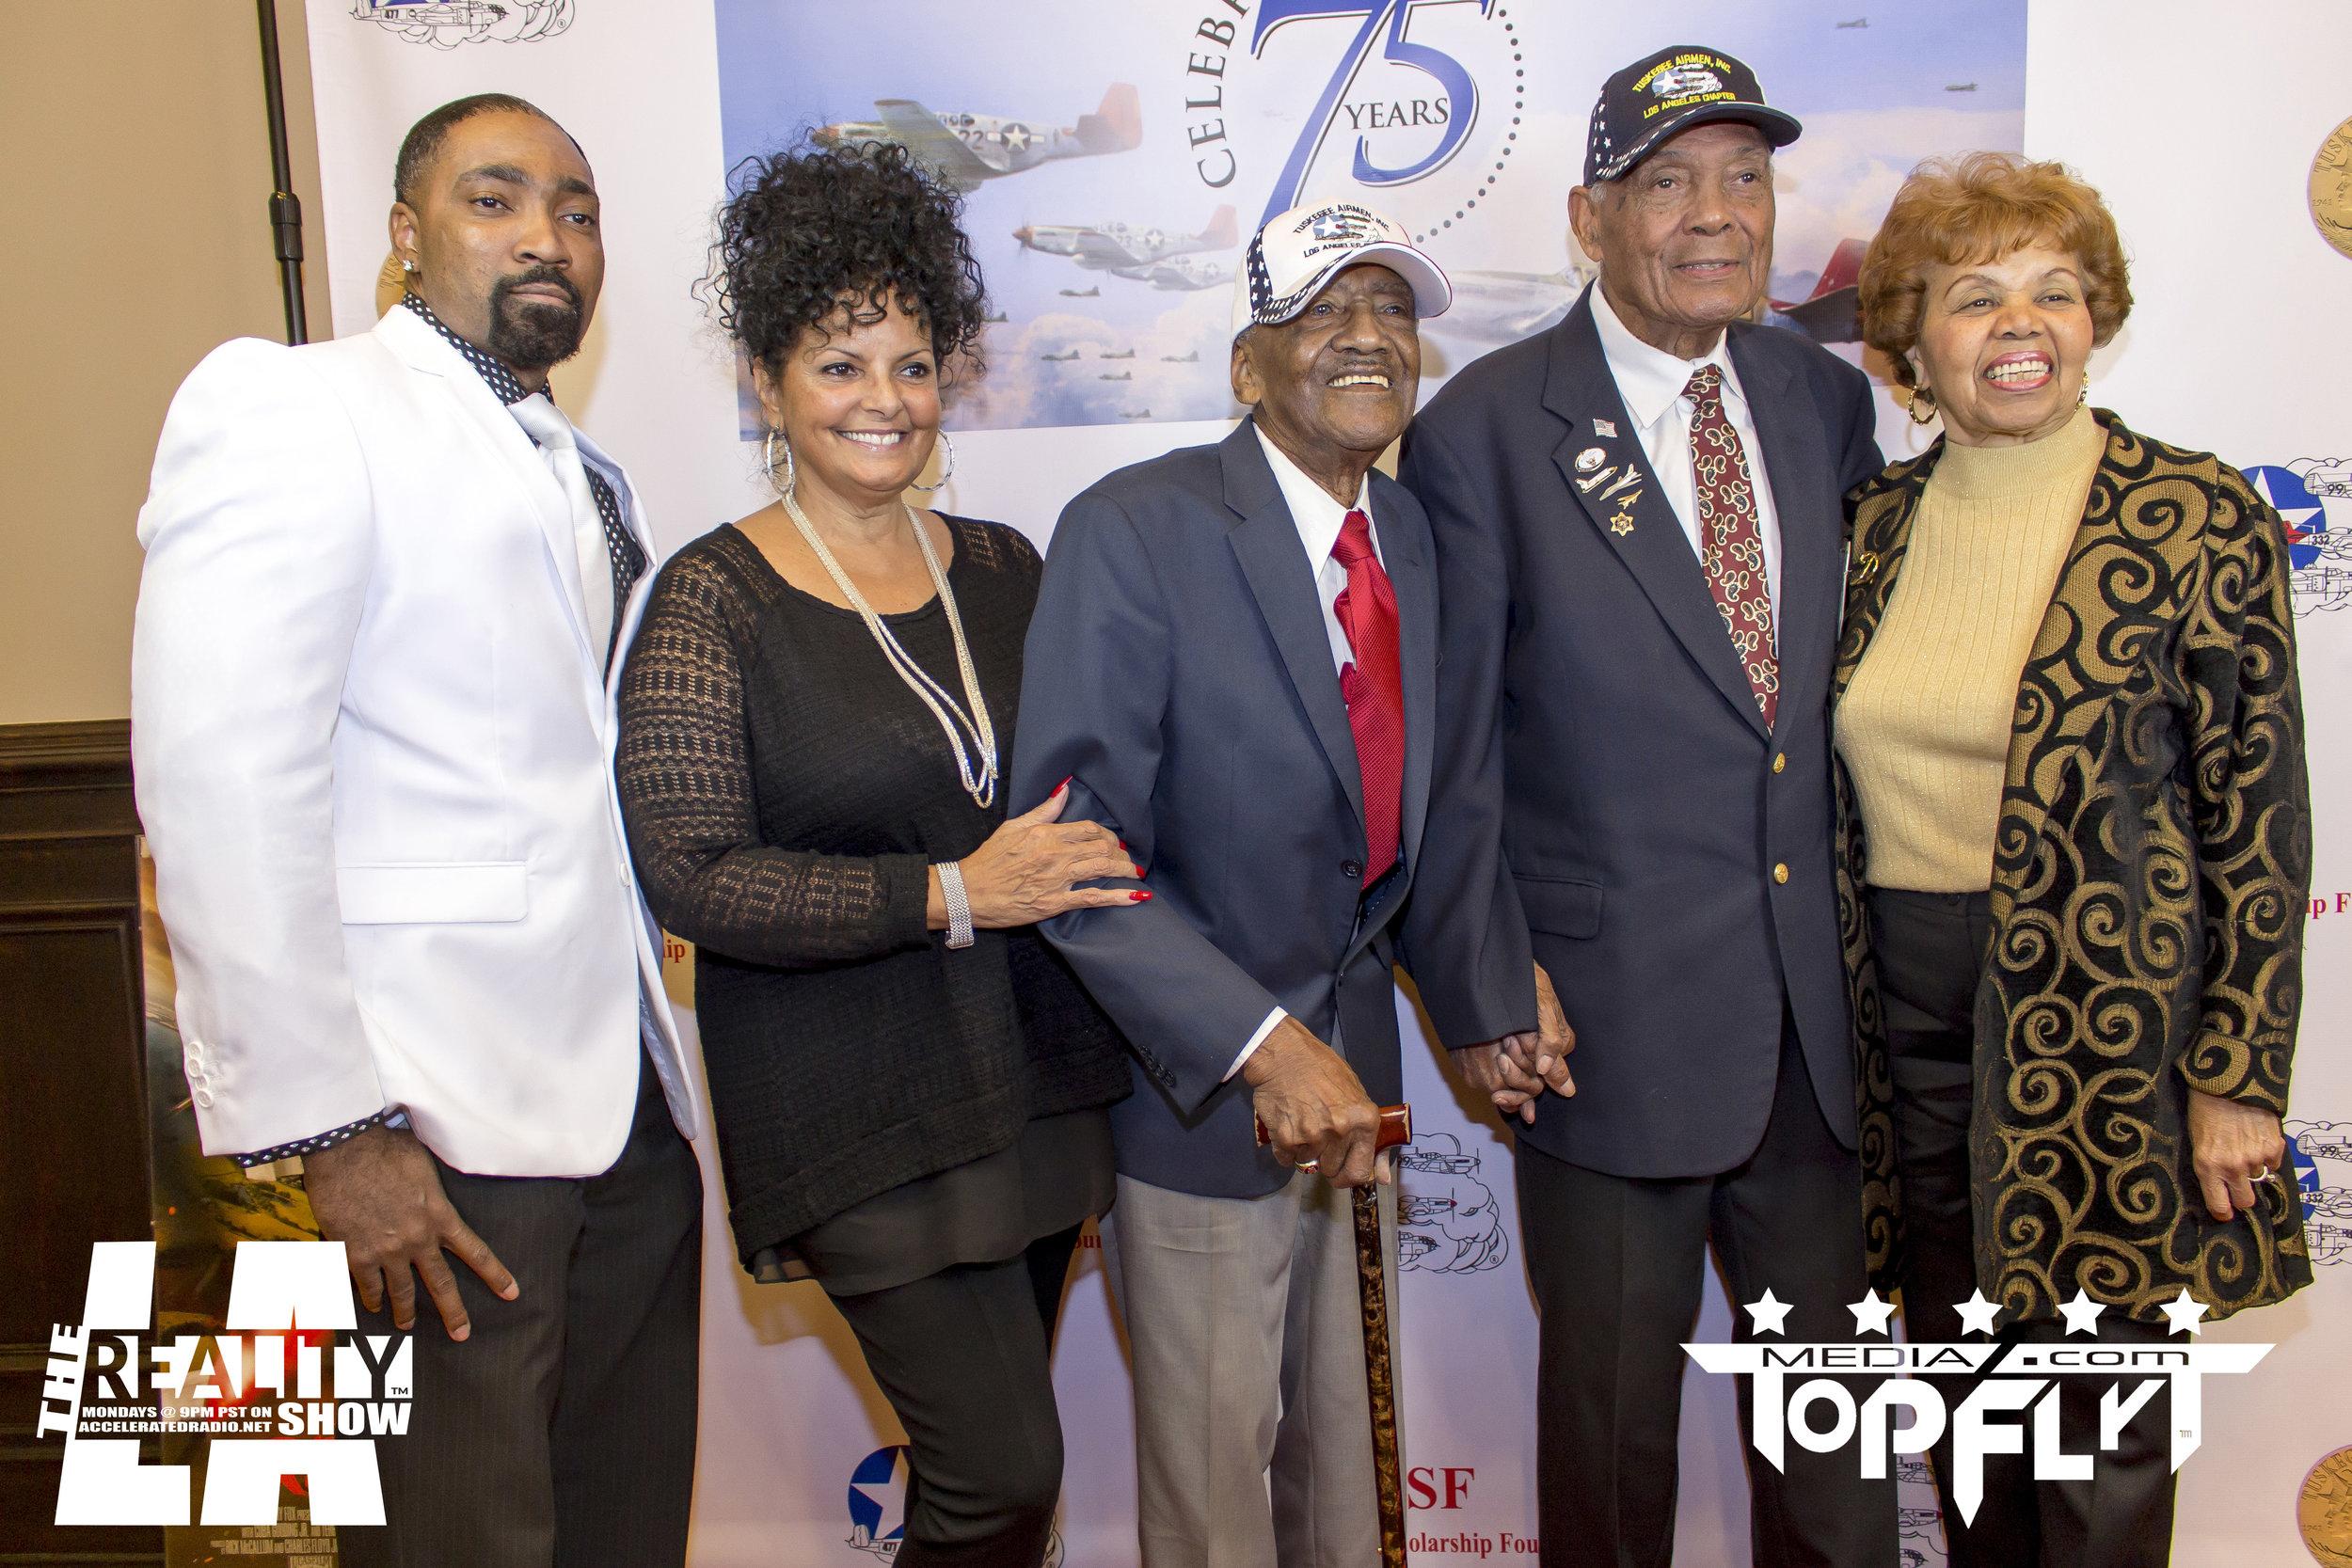 The Reality Show LA - Tuskegee Airmen 75th Anniversary VIP Reception_33.jpg